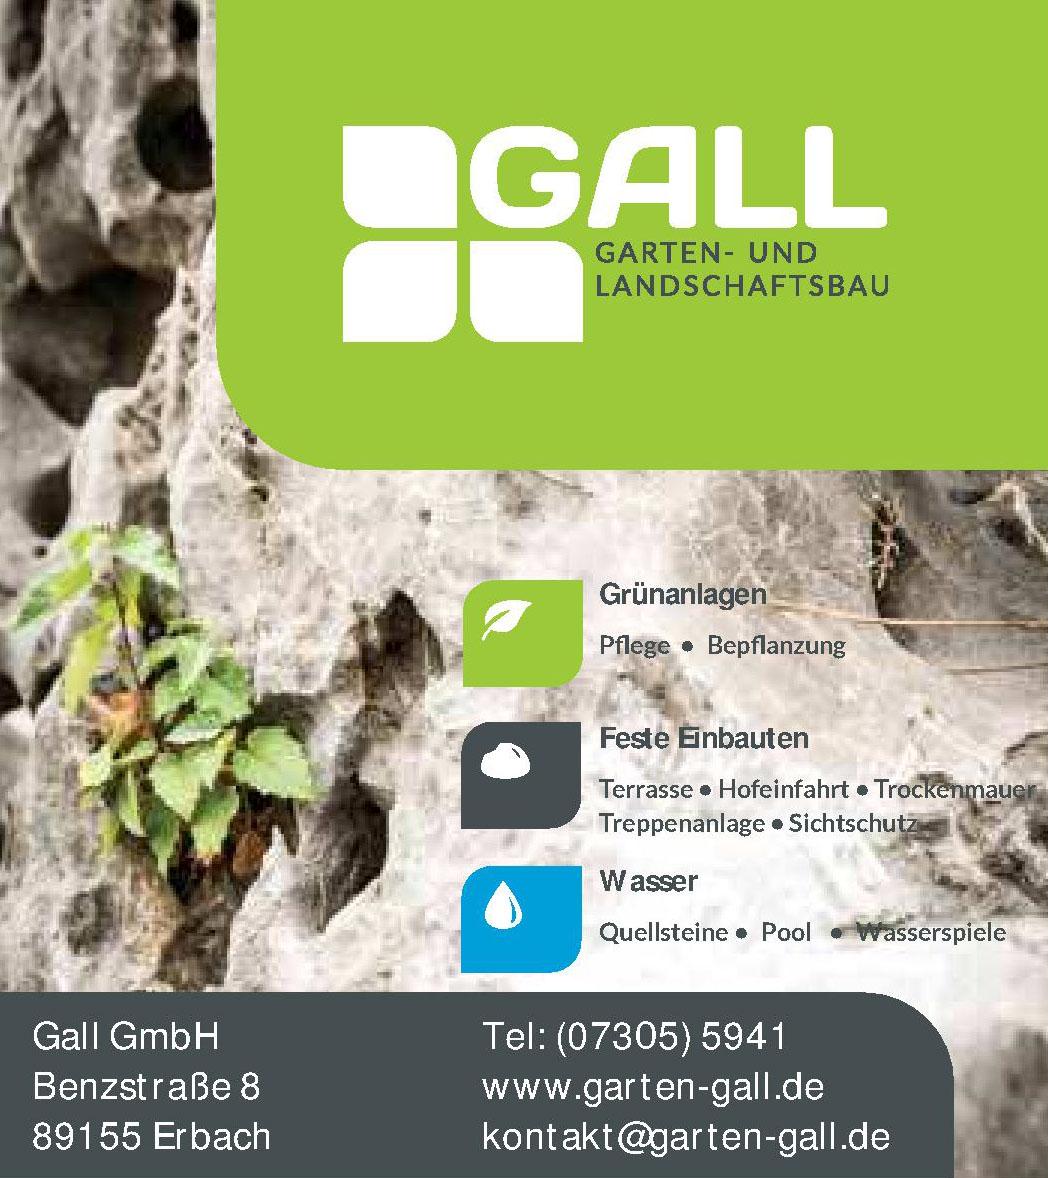 Gall GmbH